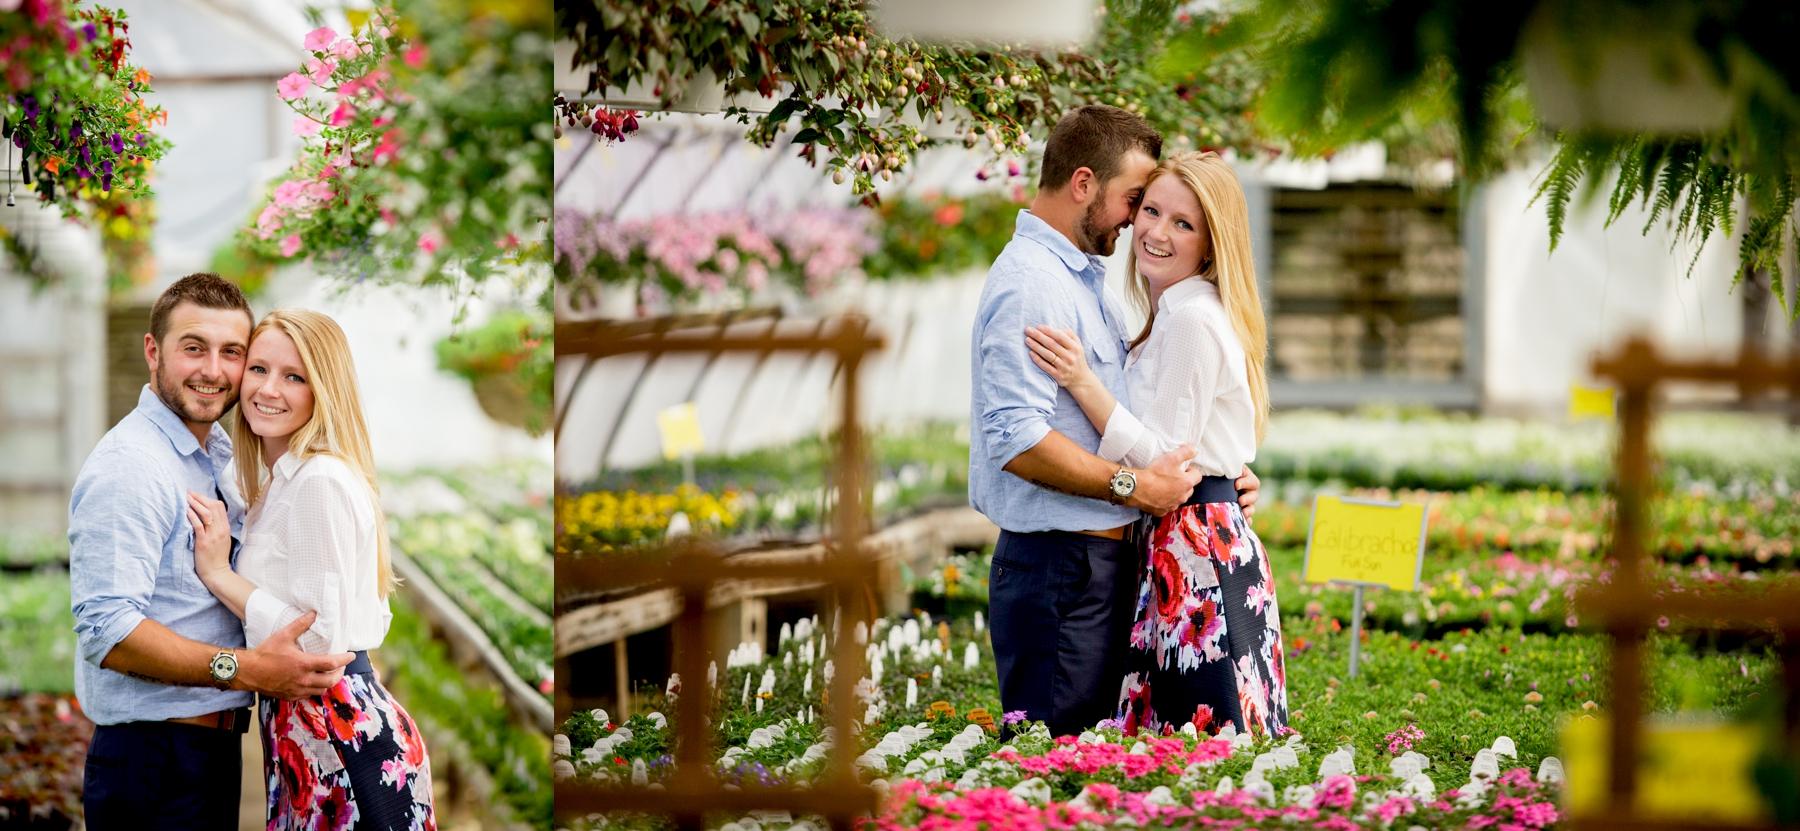 Brandon_Shafer_Photography_Shane_Ashley_Greenhouse_Farm_Michigan_Engagement_0006.jpg